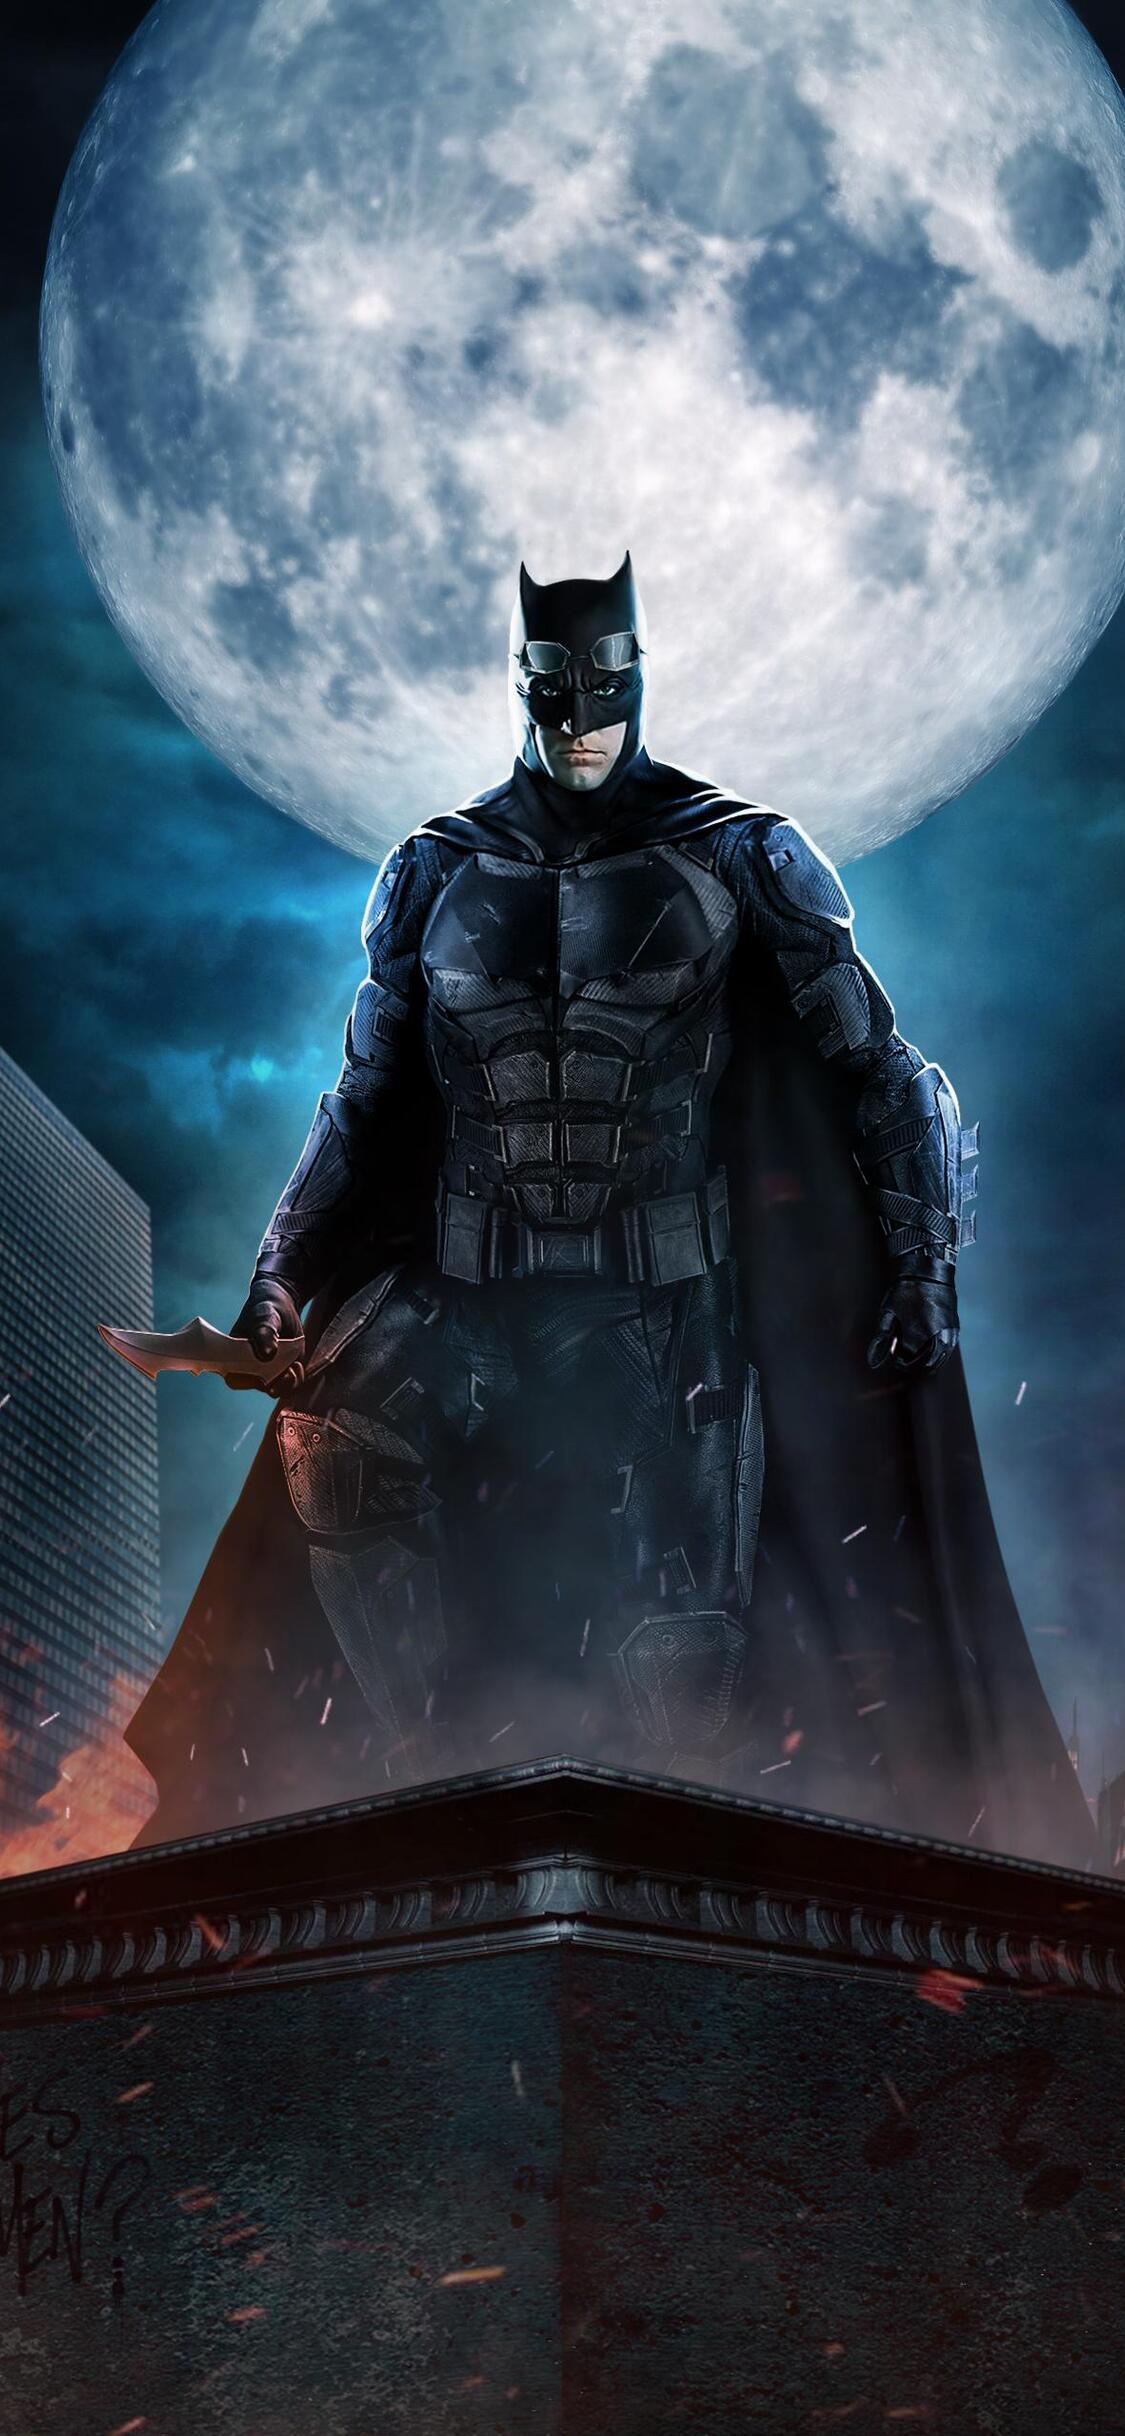 1125x2436 Justice League Batman The Dark Knight Fan Art Iphone Xs